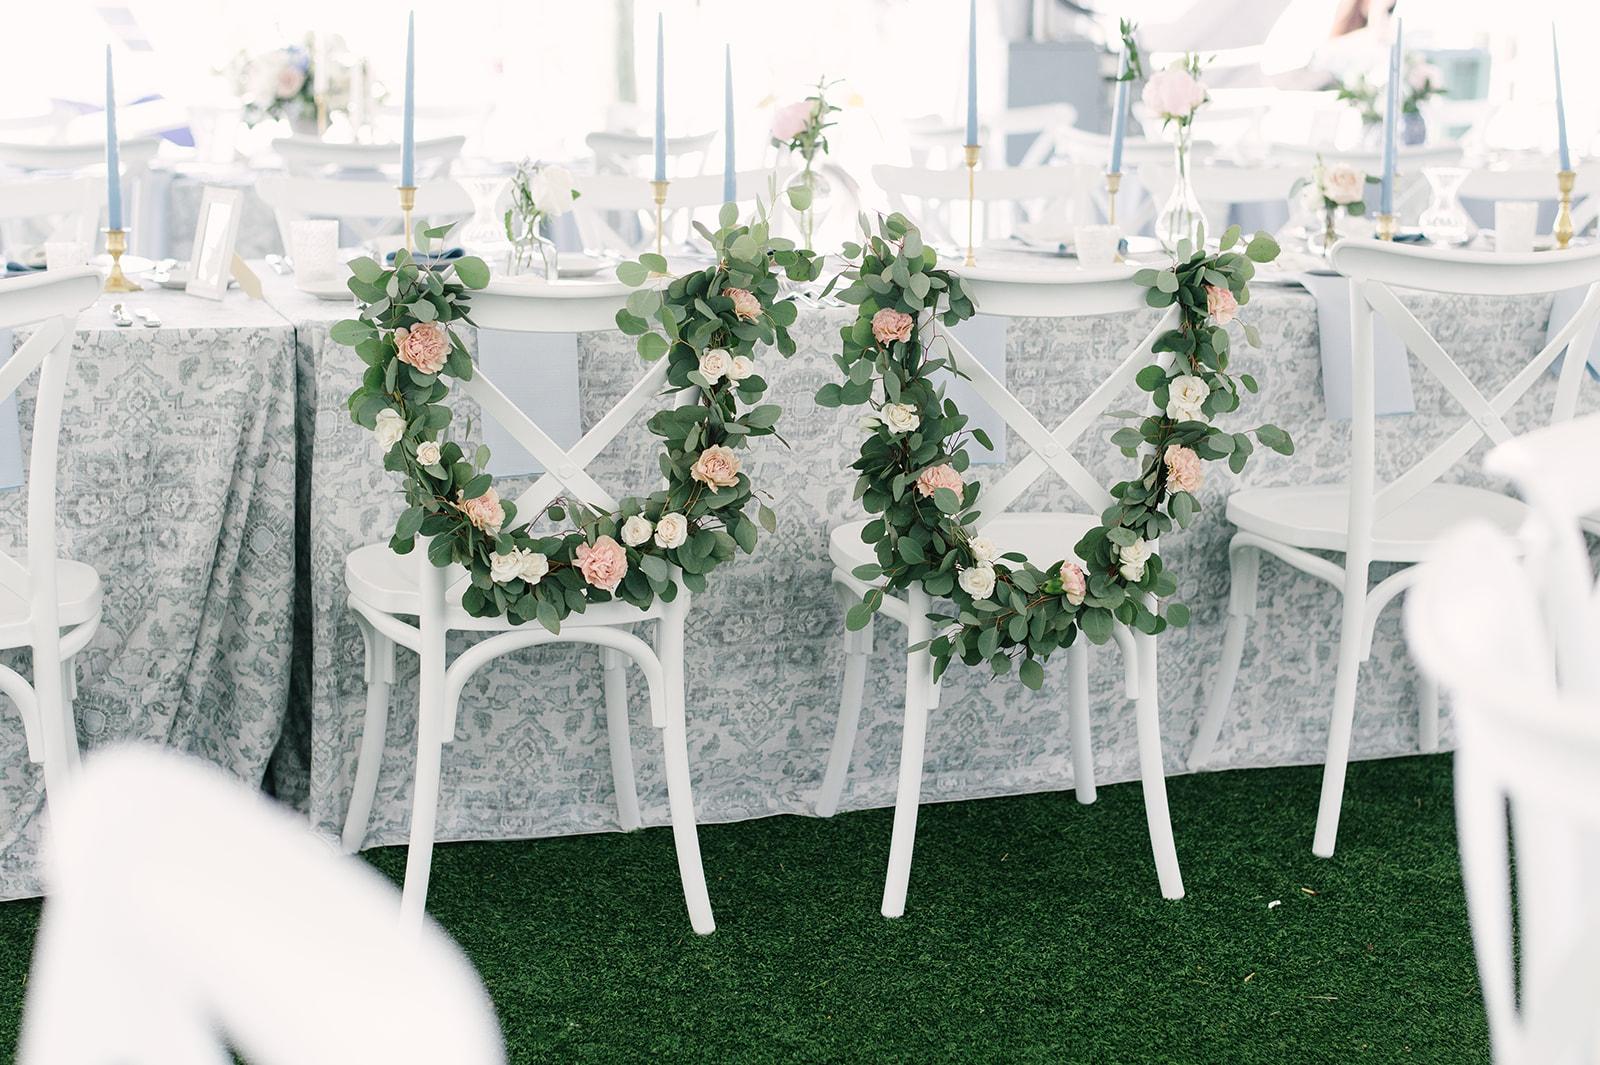 reception-boland-sarah-street-photography-30.jpgCourtney Inghram Cavalier Virginia Beach Wedding Florist Southern and Coastal Wedding